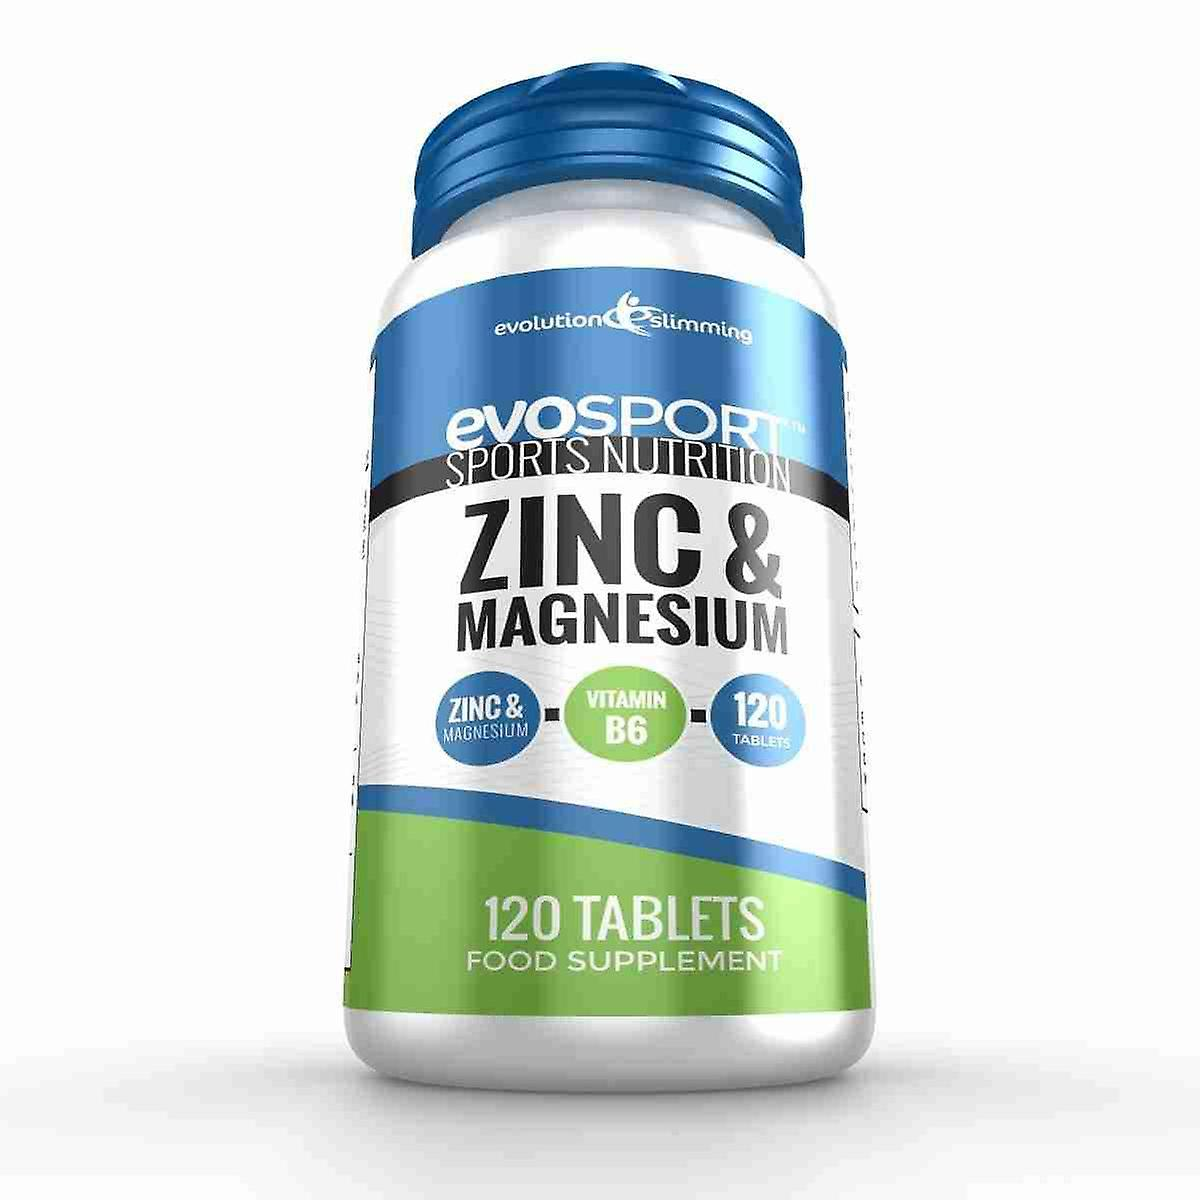 EvoSport Zinc and Magnesium ZMA - 120 Tablets - Sports Nutrition -  Evolution Slimming